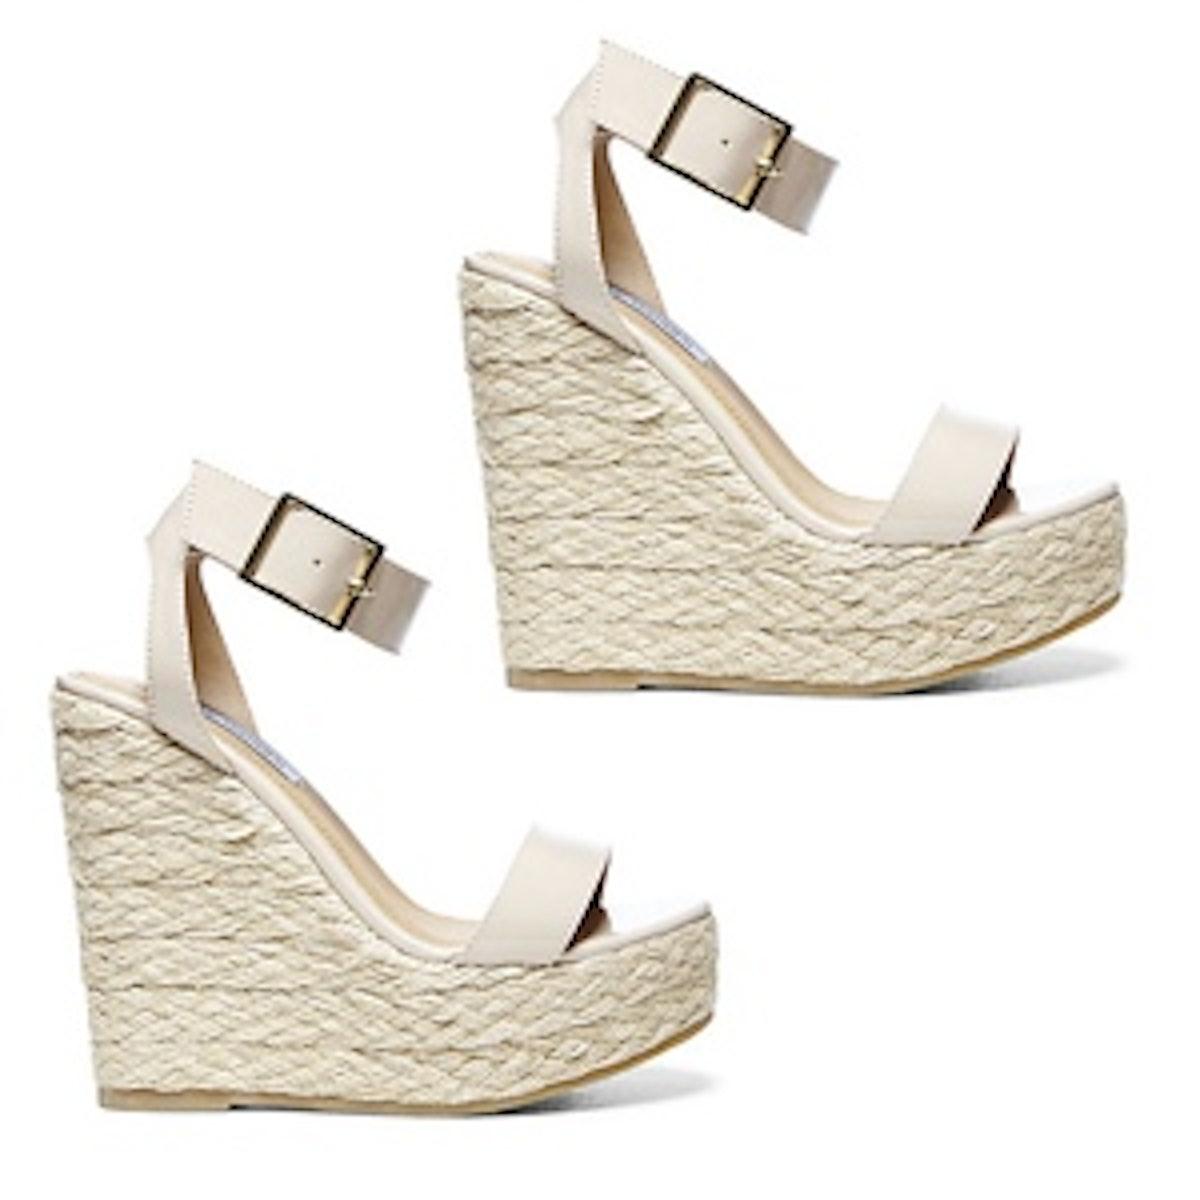 Hamptin Sandals